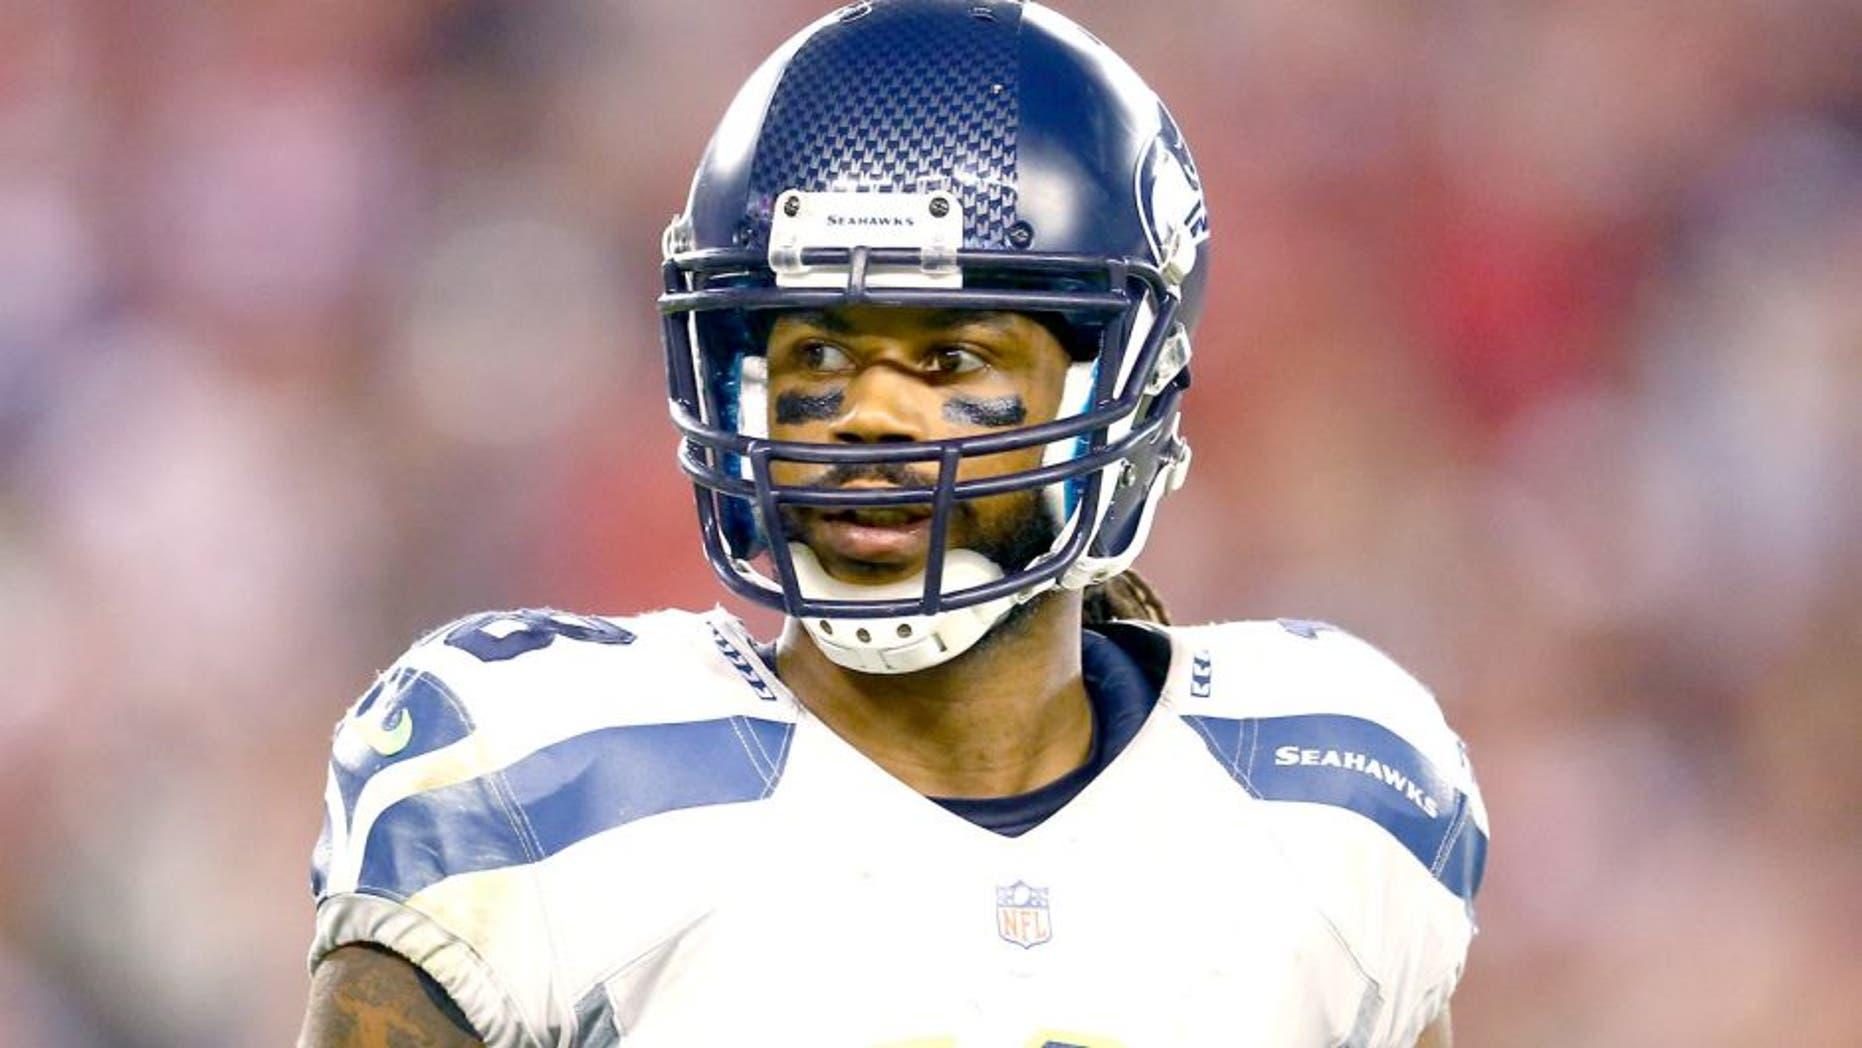 Oct 17, 2013; Phoenix, AZ, USA; Seattle Seahawks wide receiver Sidney Rice (18) against the Arizona Cardinals at University of Phoenix Stadium. Mandatory Credit: Mark J. Rebilas-USA TODAY Sports